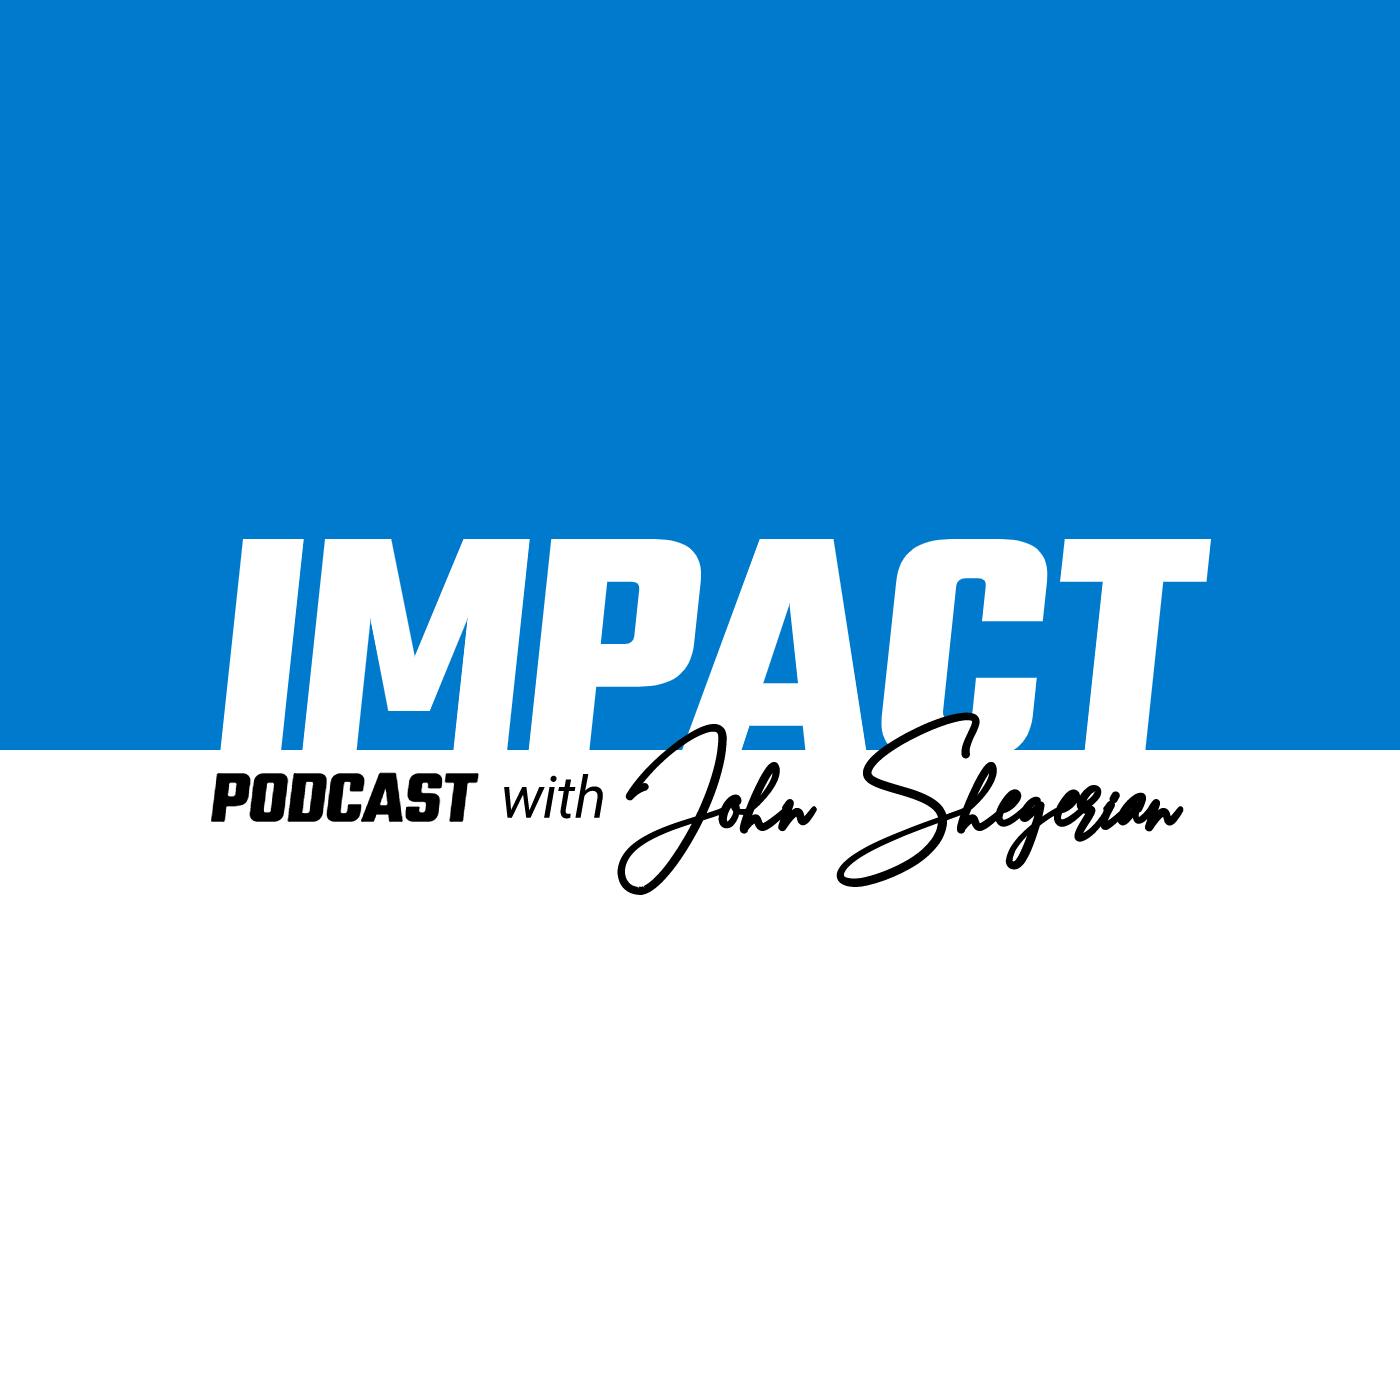 Impact Podcast with John Shegerian show art